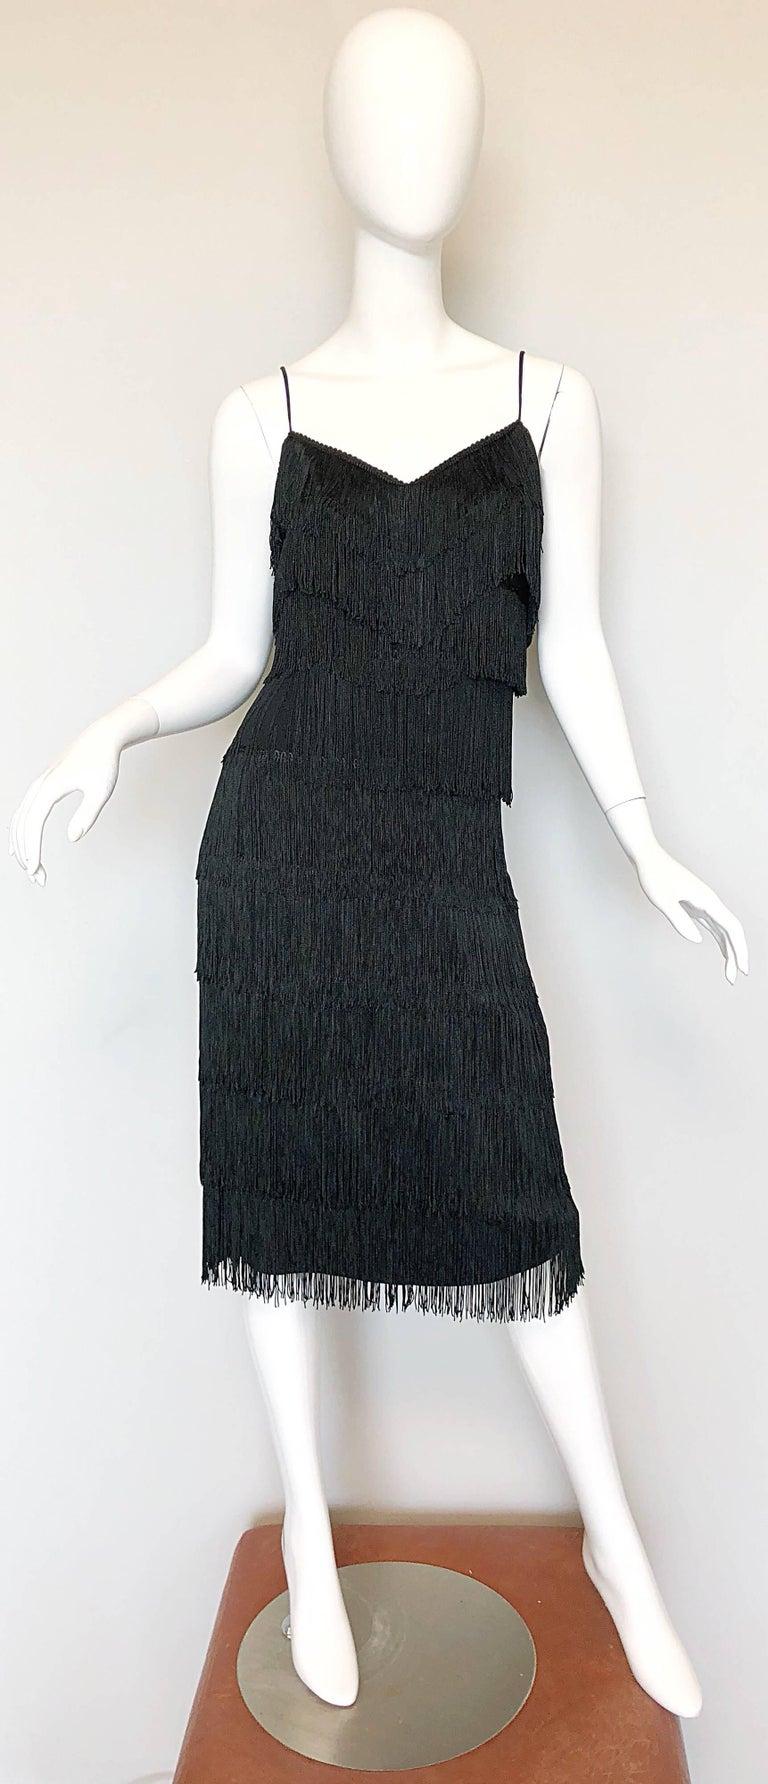 1970s Lilli Diamond Black Fully Fringed Vintage Flapper Style 70s Cocktail Dress For Sale 5